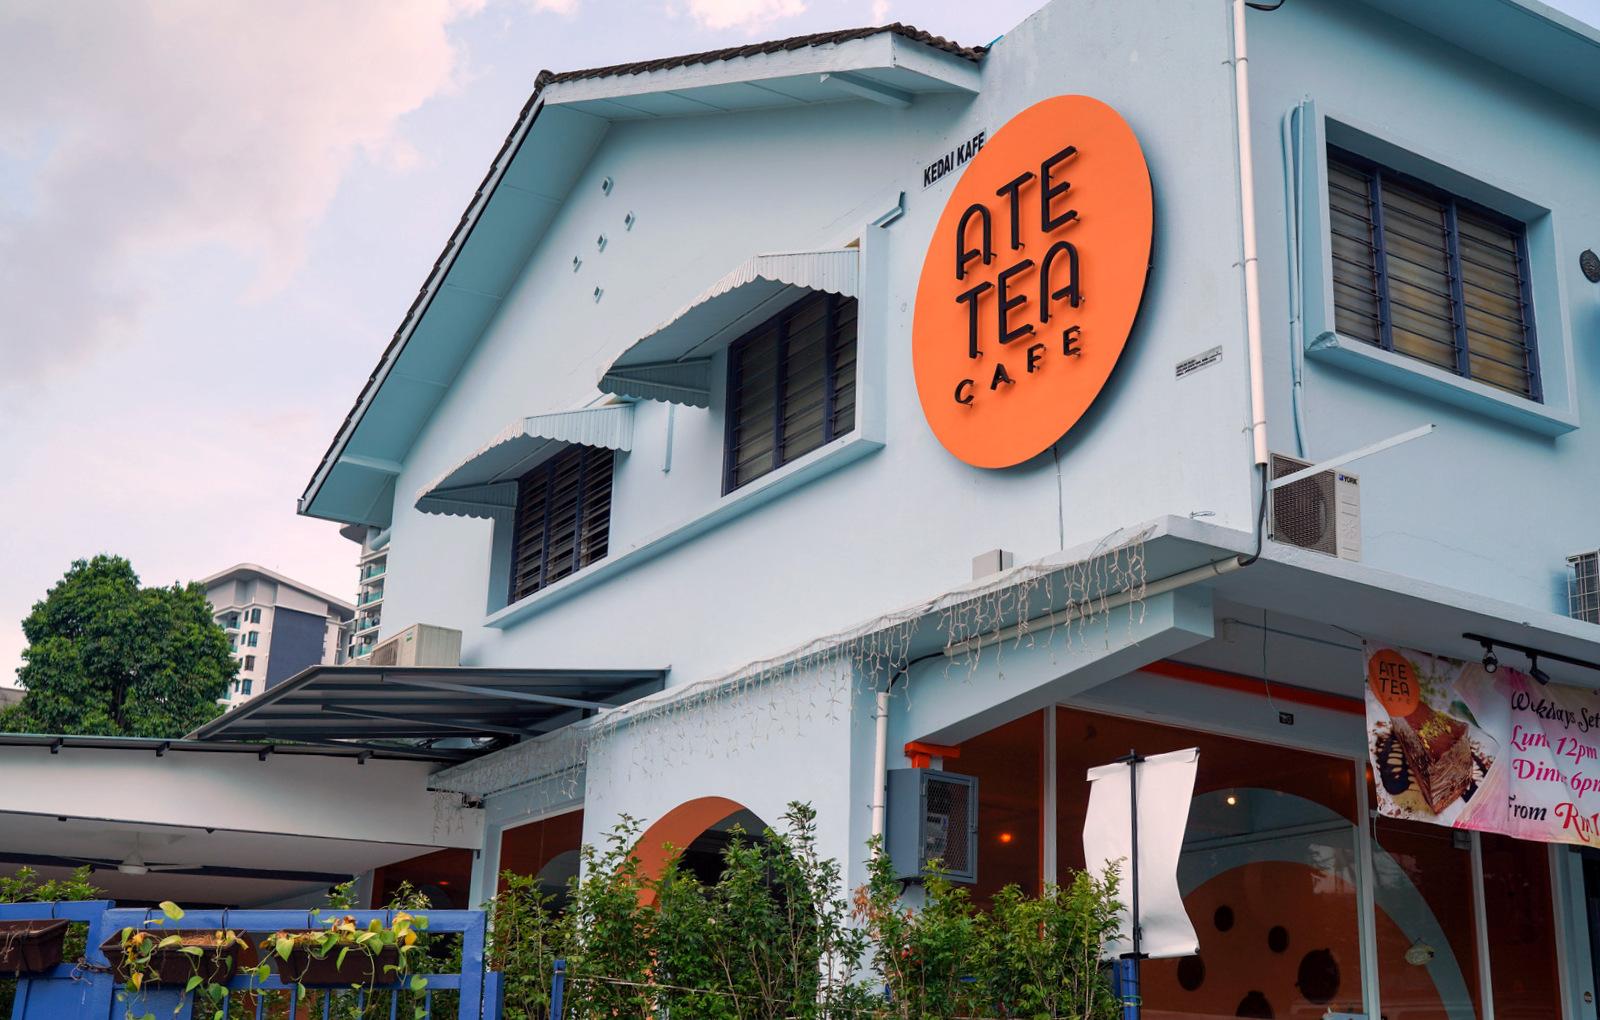 Ate Tea Cafe, Happy Garden